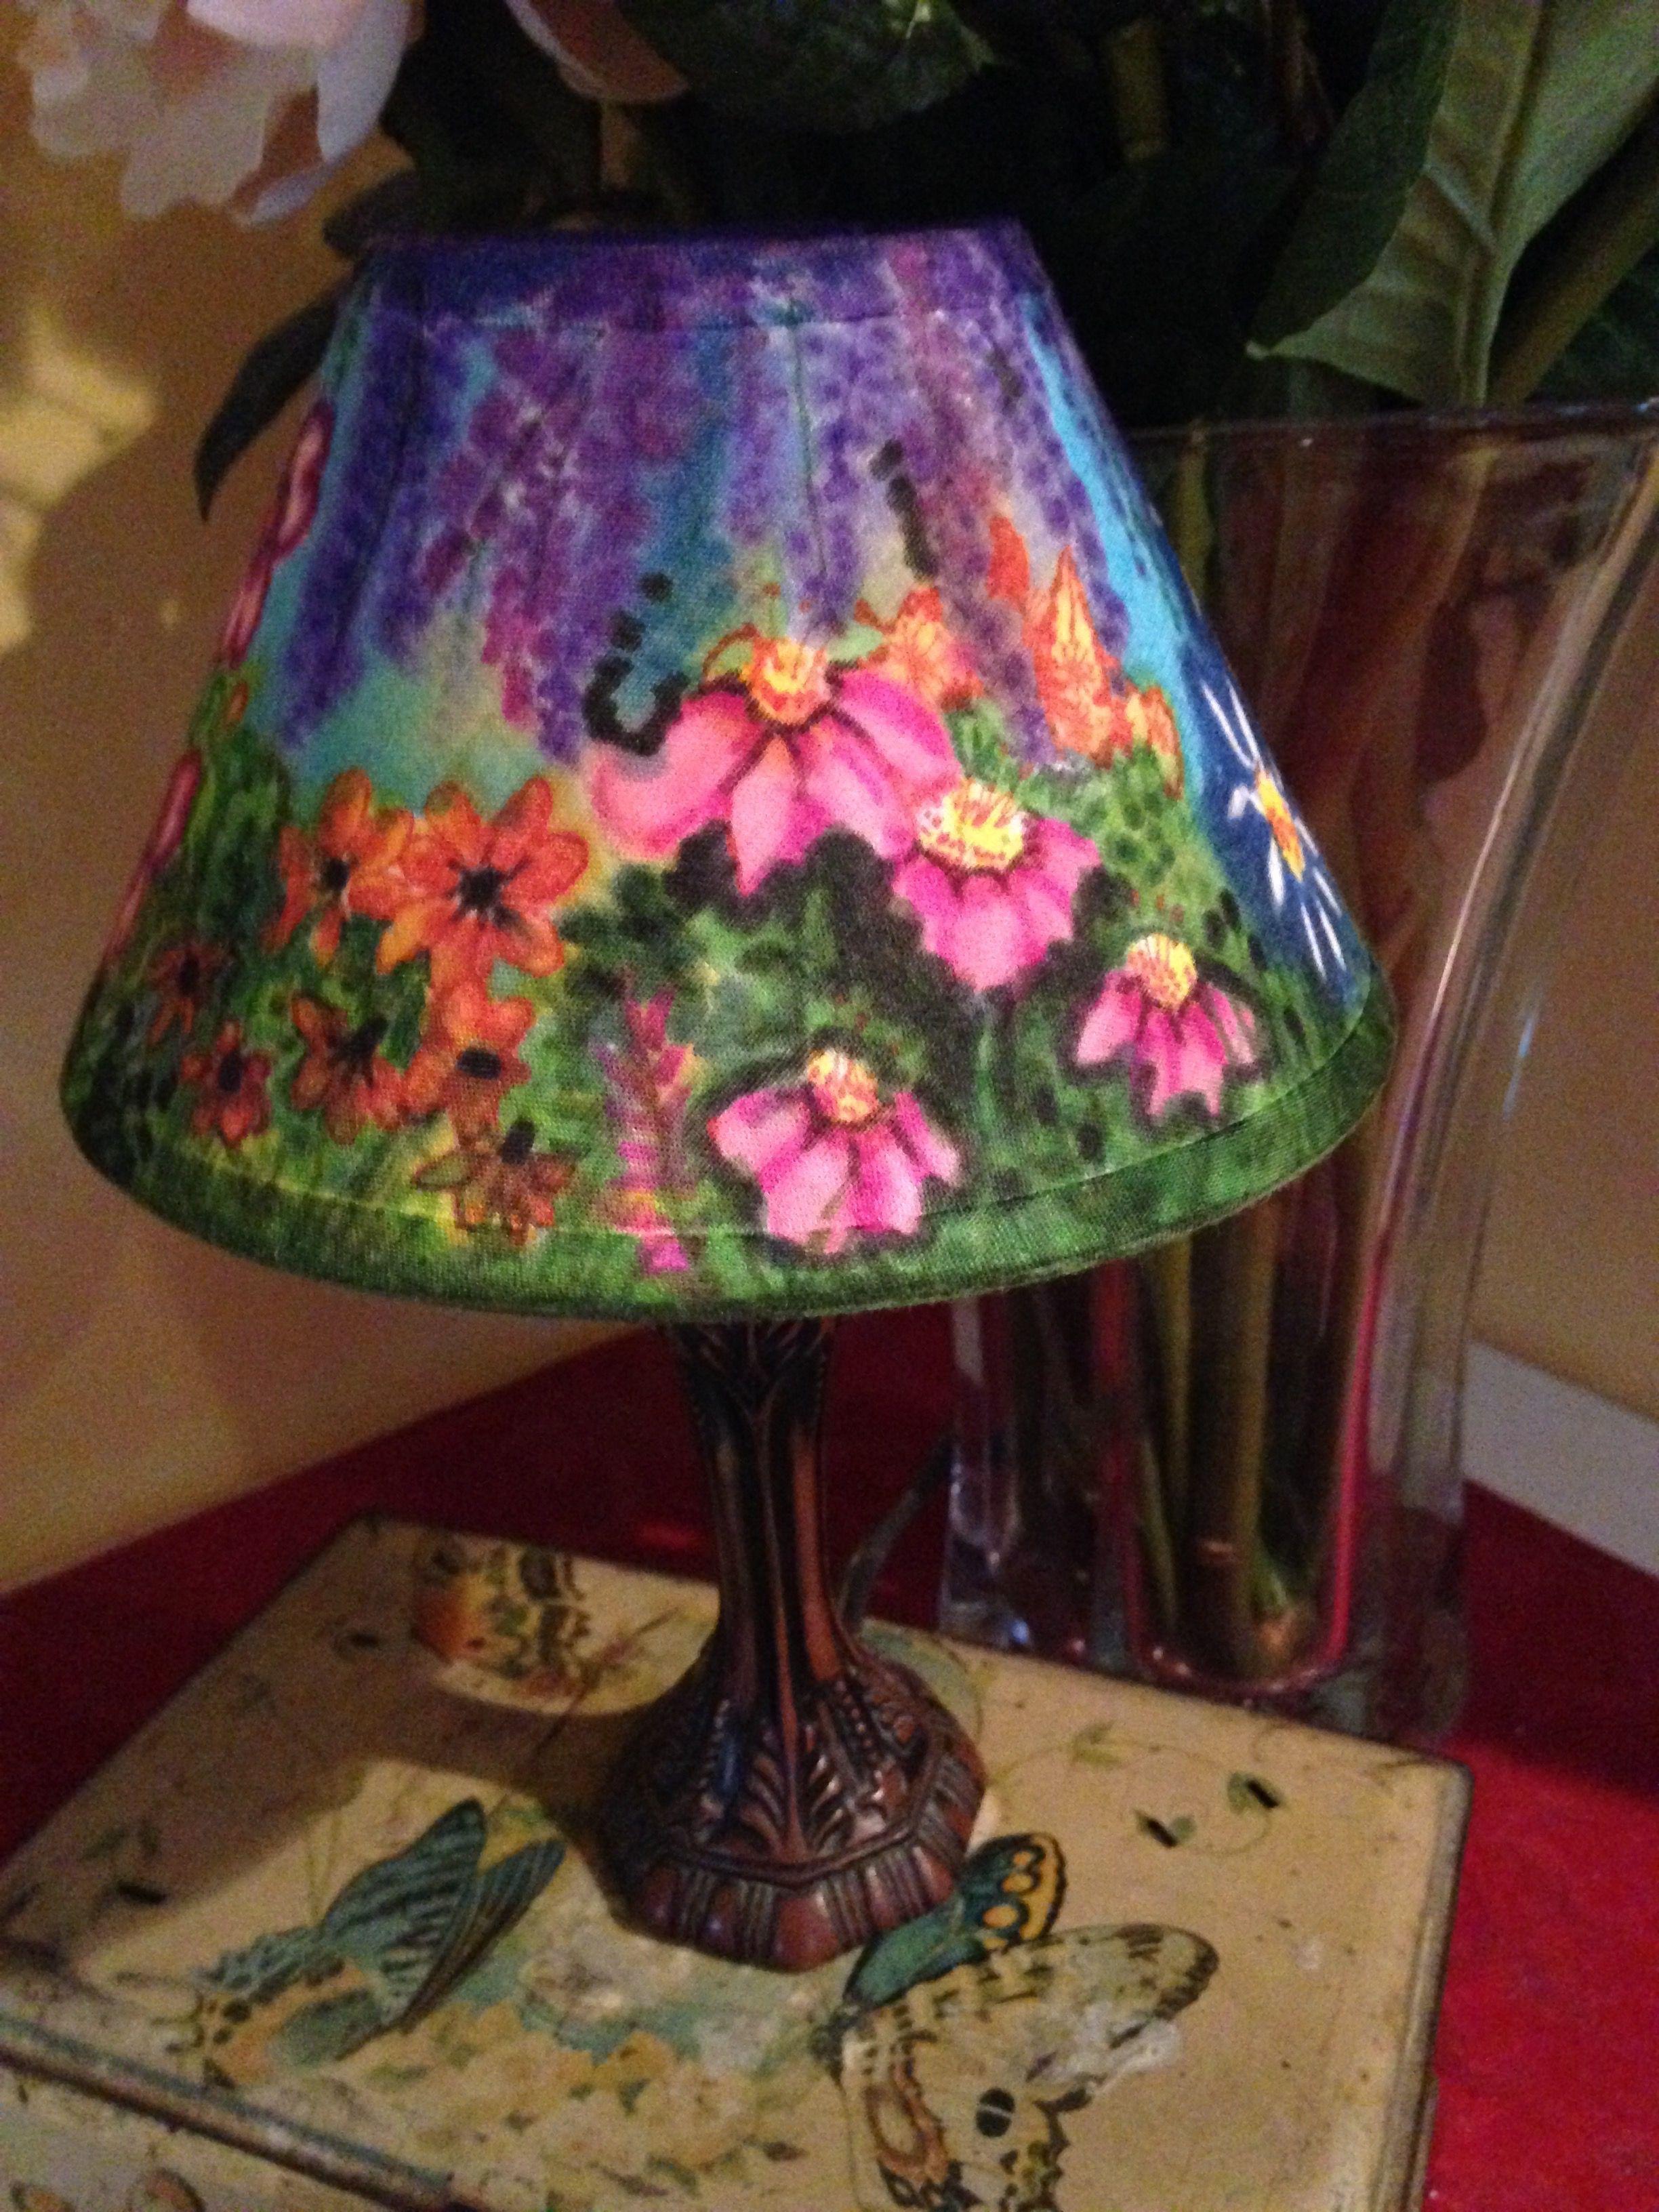 Pin By Enkhtur Bayrsaikhan O On Lamp Shades Painting Lamp Shades Colorful Lamp Shades Lampshade Designs